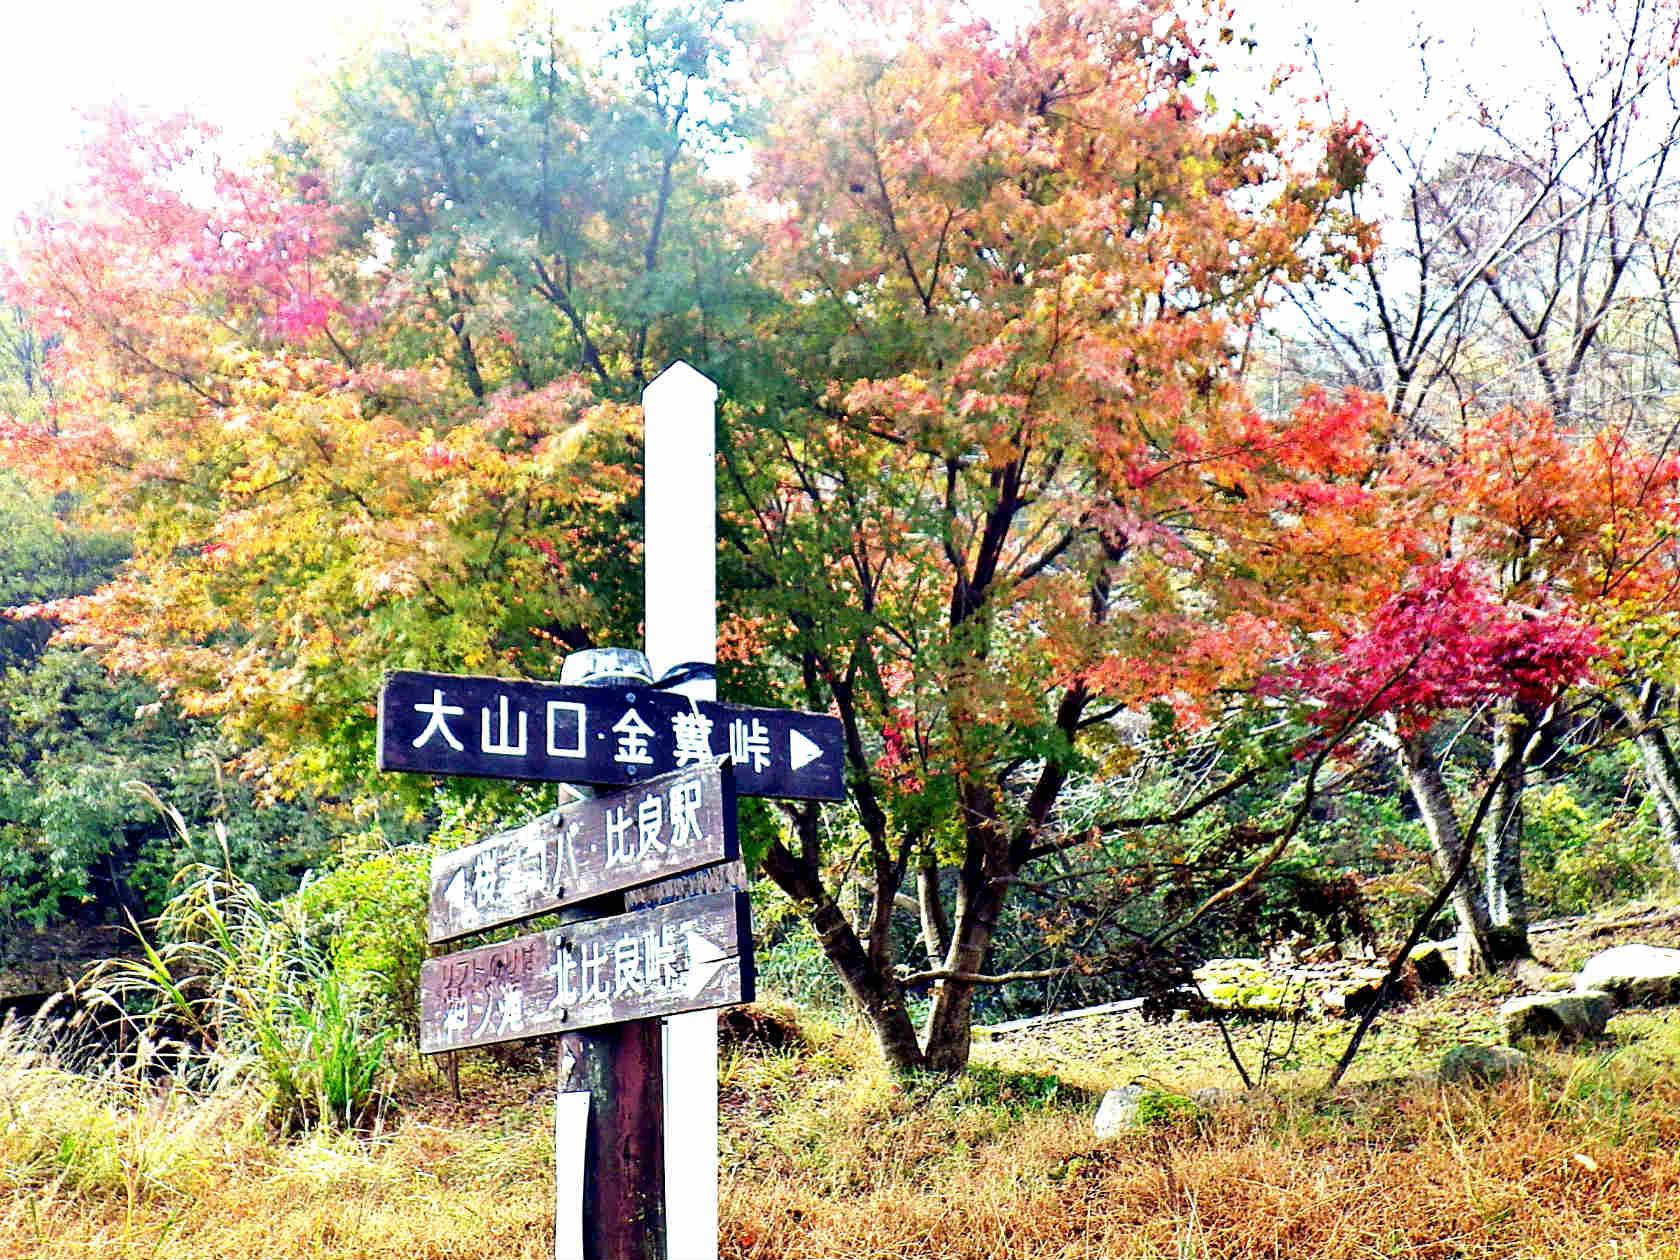 02a 登山口の標識